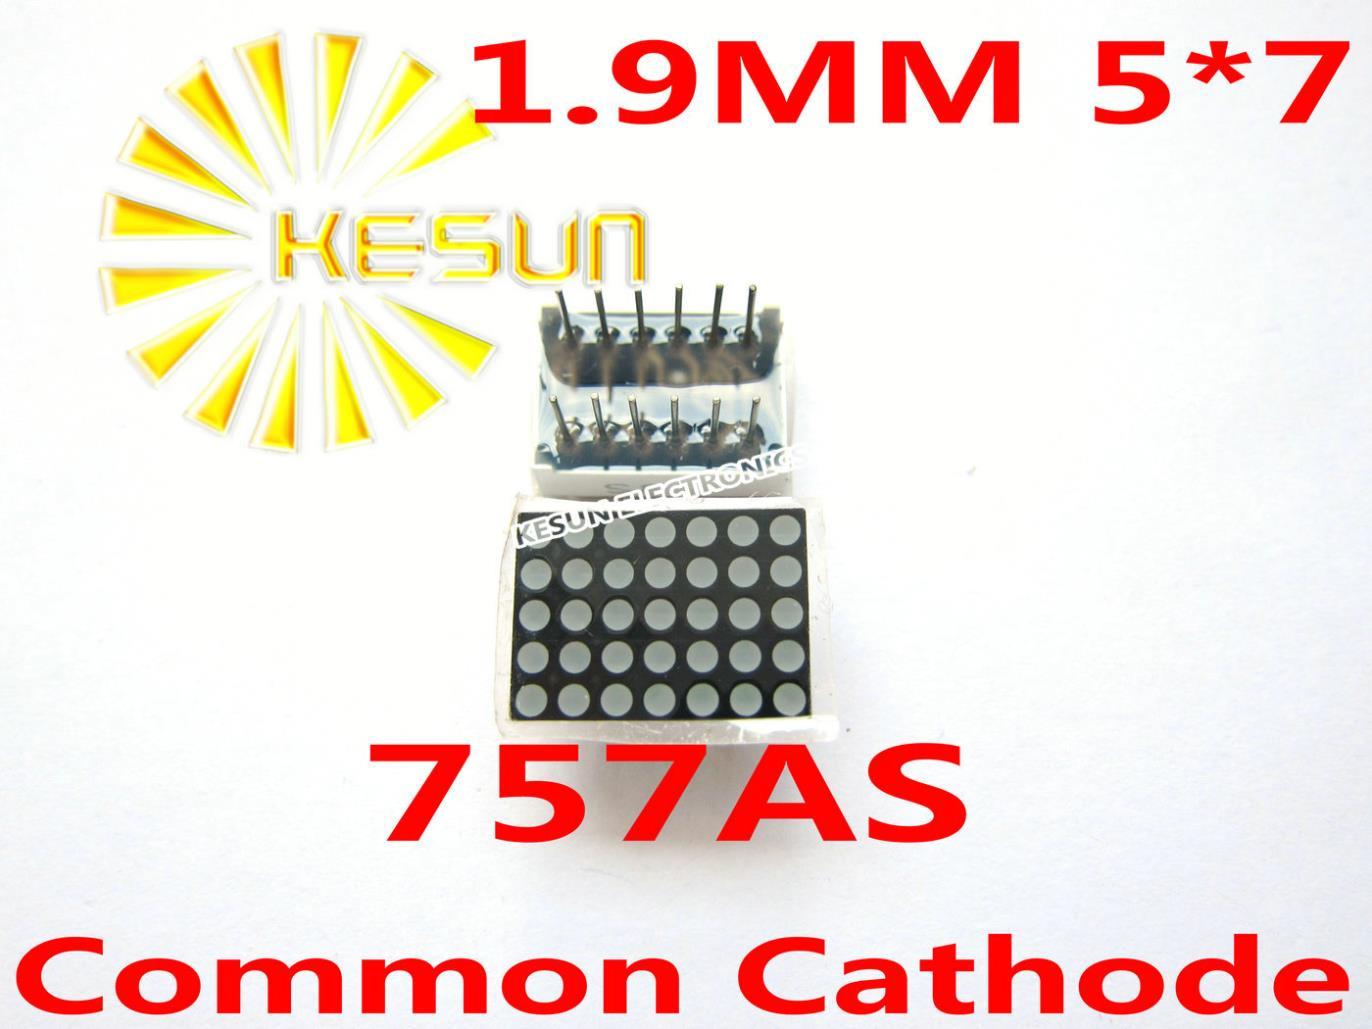 وحدة عرض LED ، 50 قطعة × 1.9 مللي متر ، 5X7 ، أحمر مشترك ، كاثود/أنود ، مصفوفة منقطة ، أنبوب رقمي ، 757AS ، 757BS